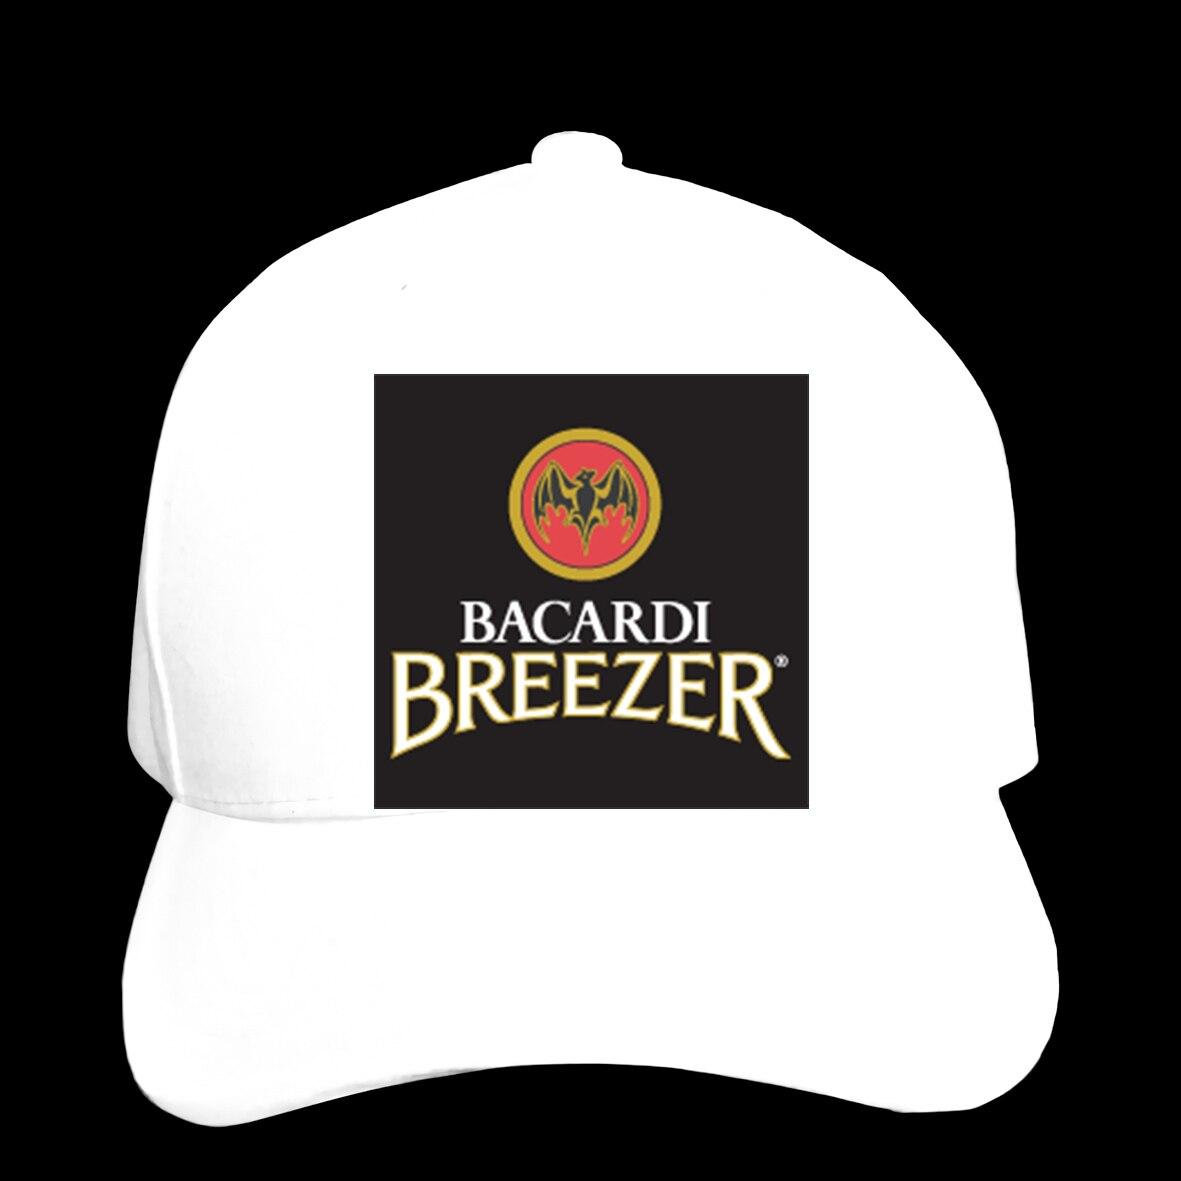 Бейсбол Кепки Bacardi Breezer логотип шляпа с остроконечным Кепки